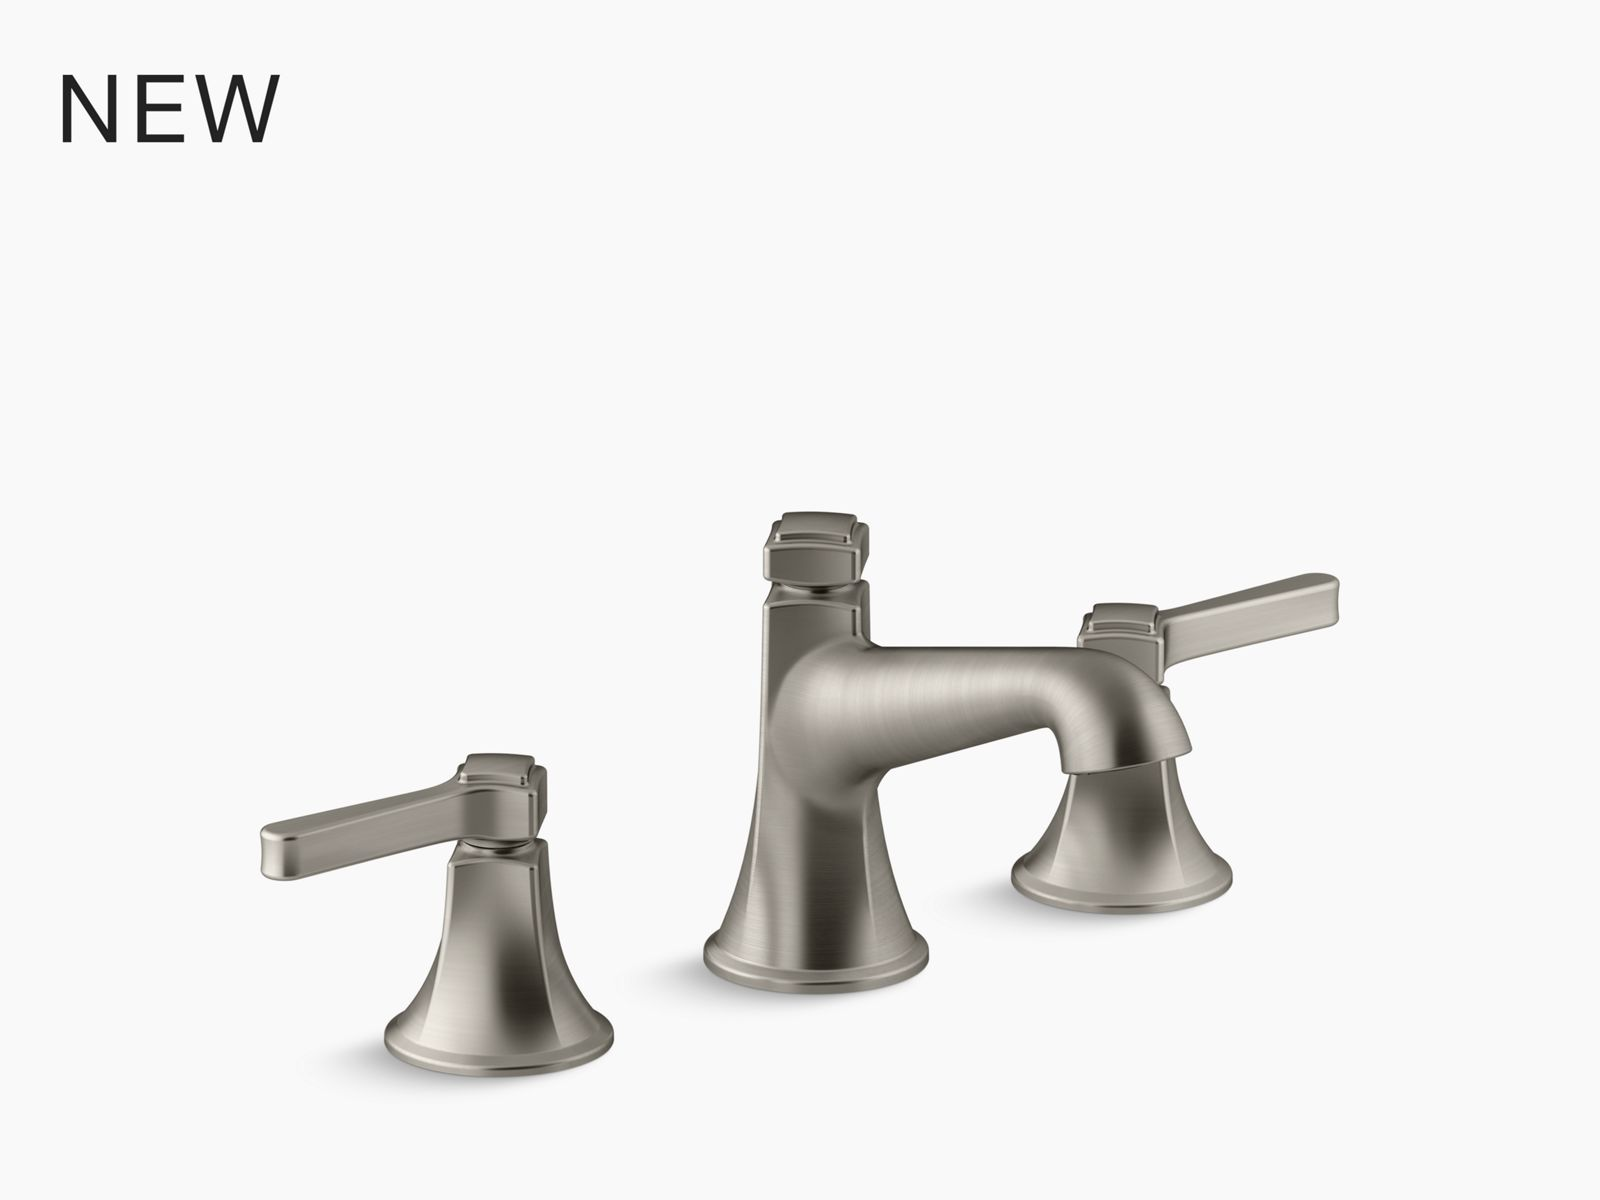 fairfax single handle bathroom sink faucet